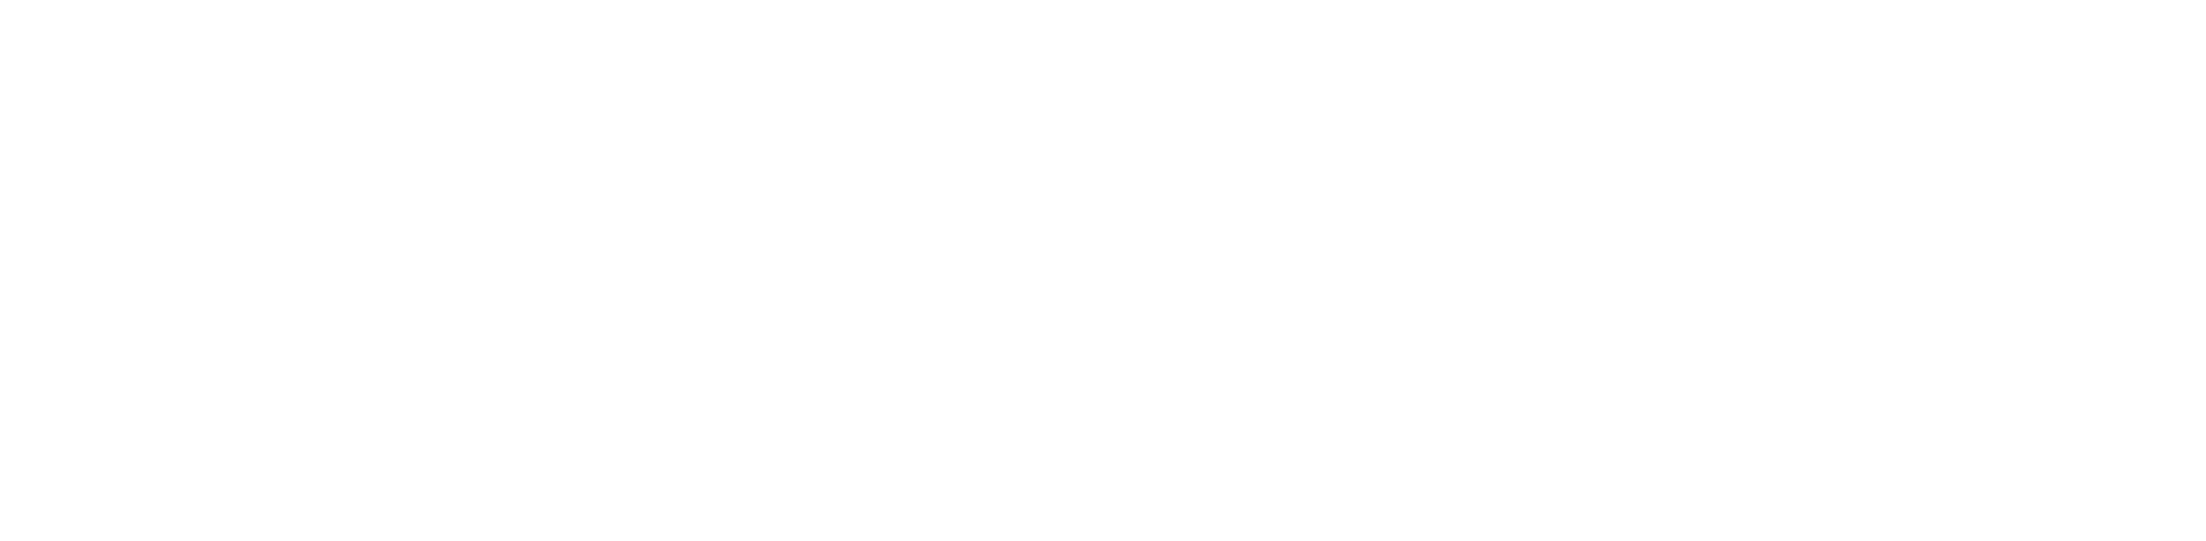 Kiwanis Europe Academy